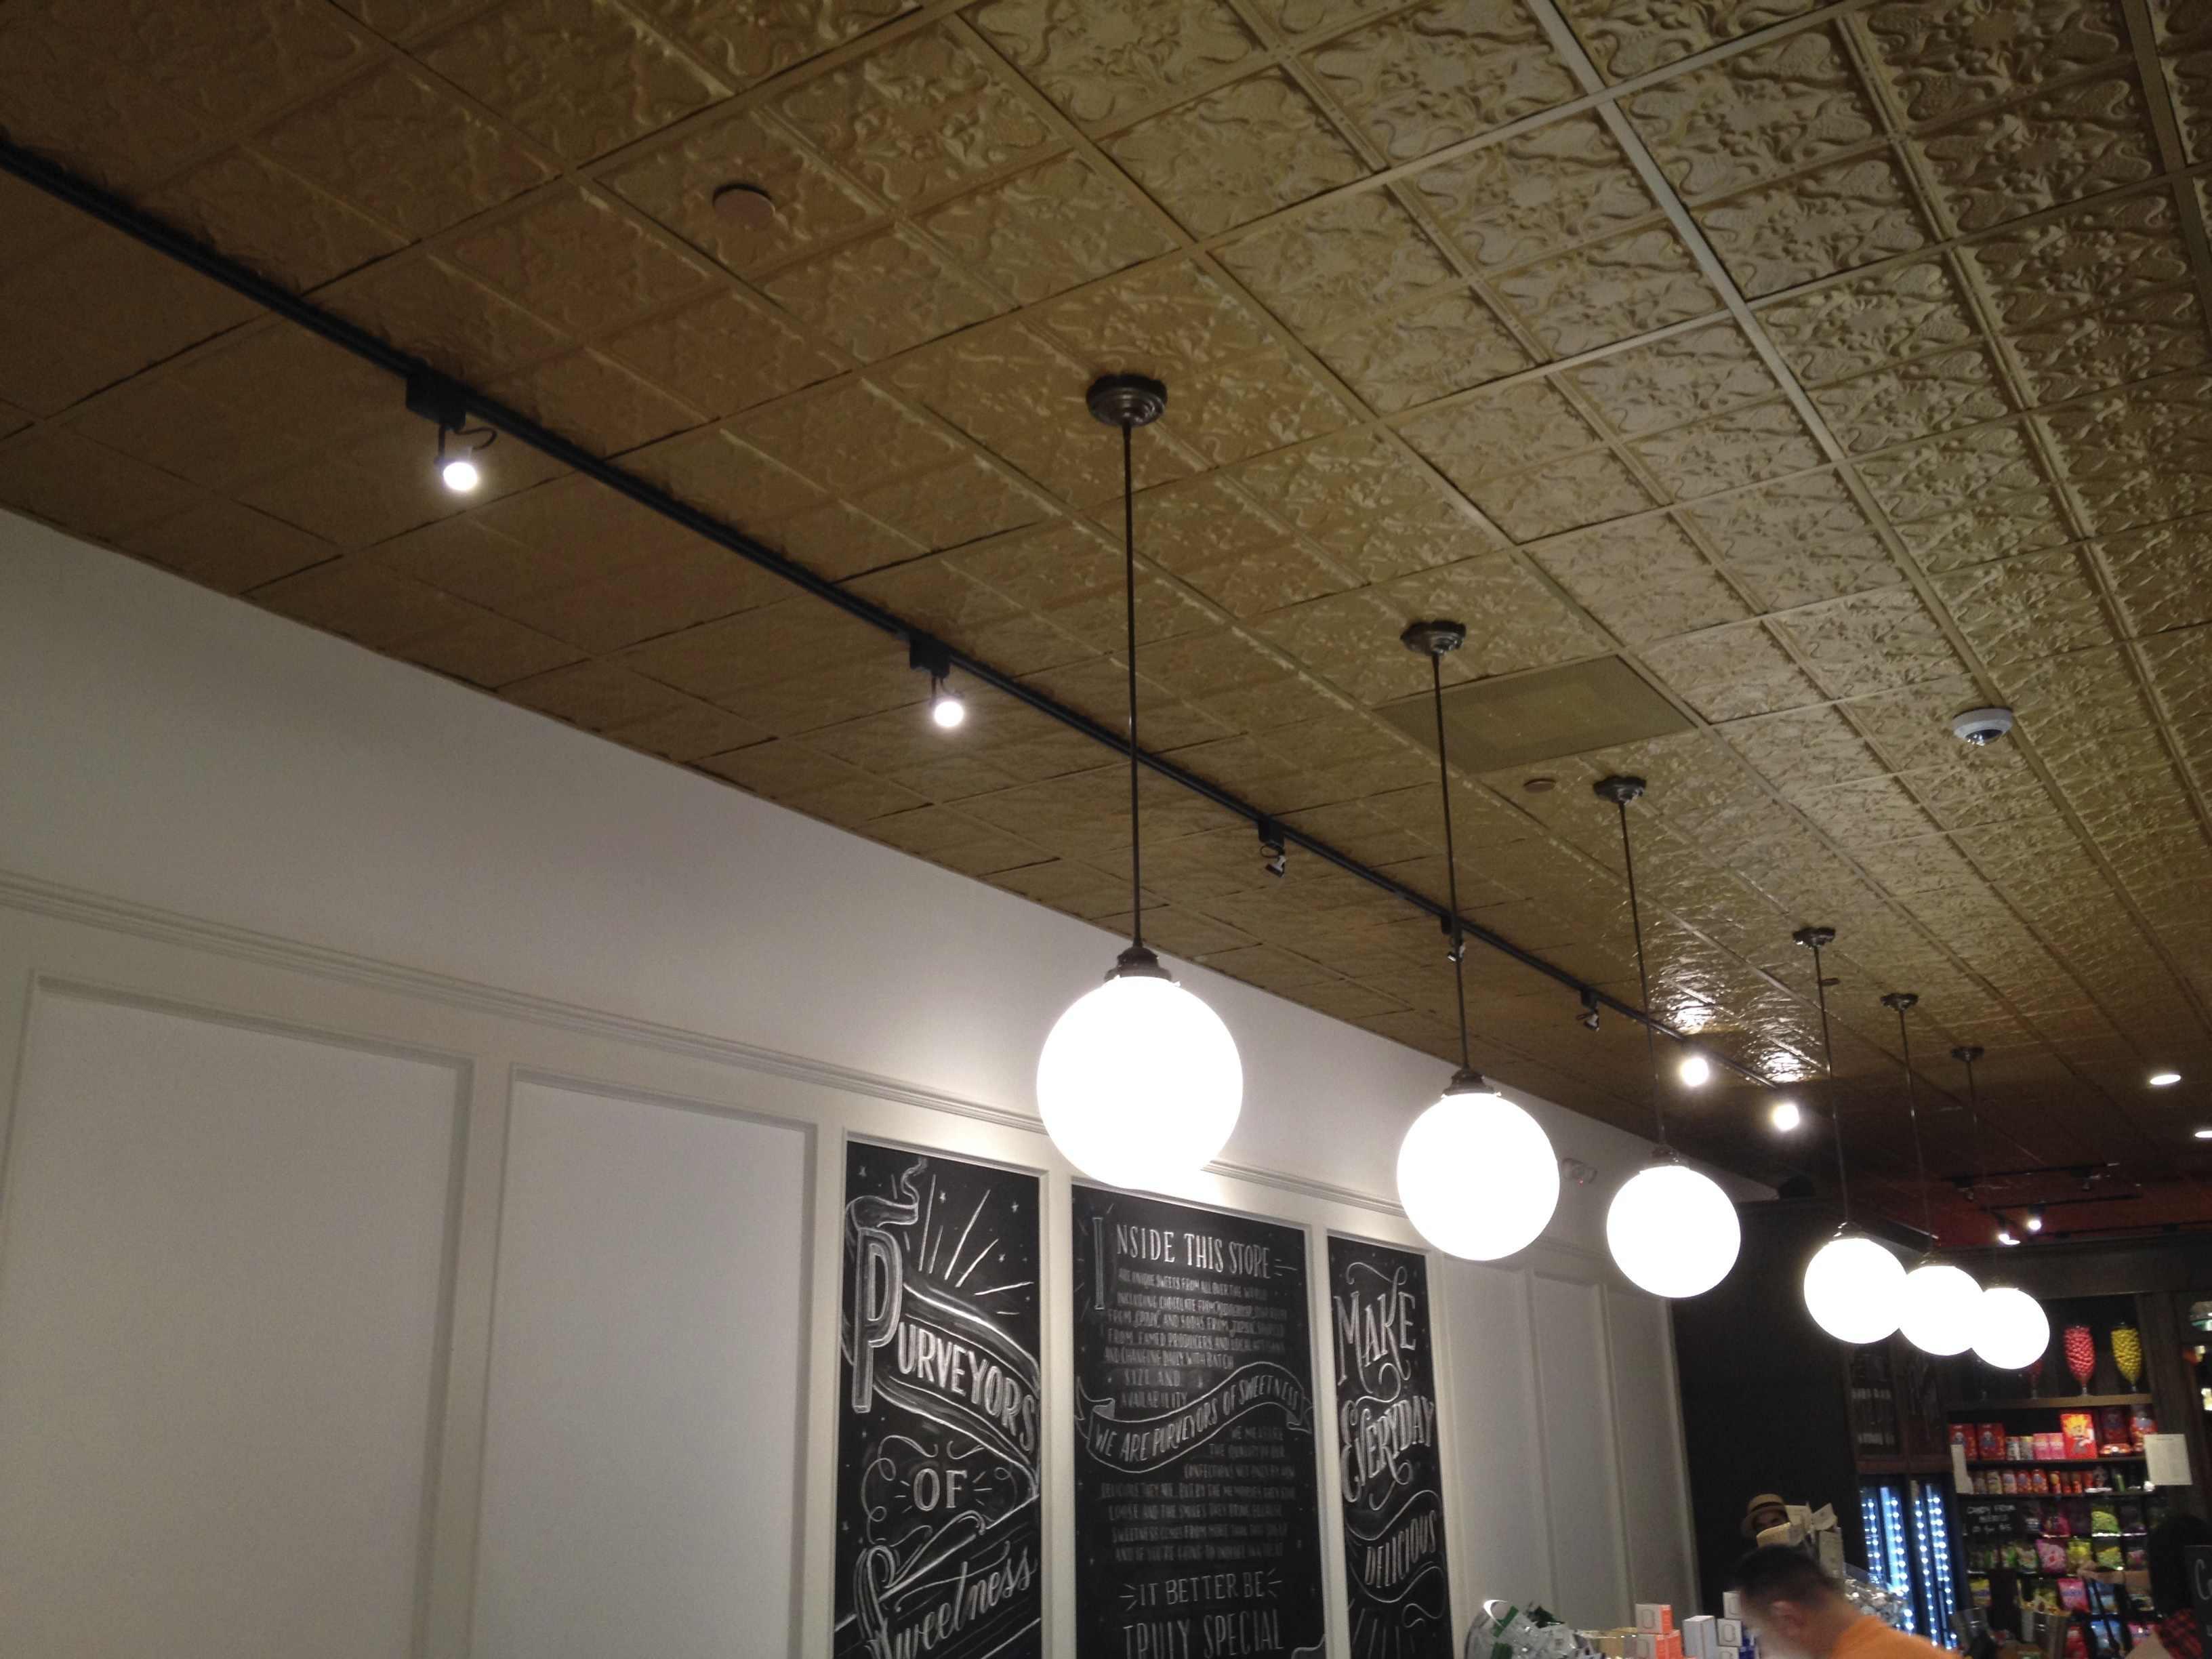 Ceiling Tile Installation